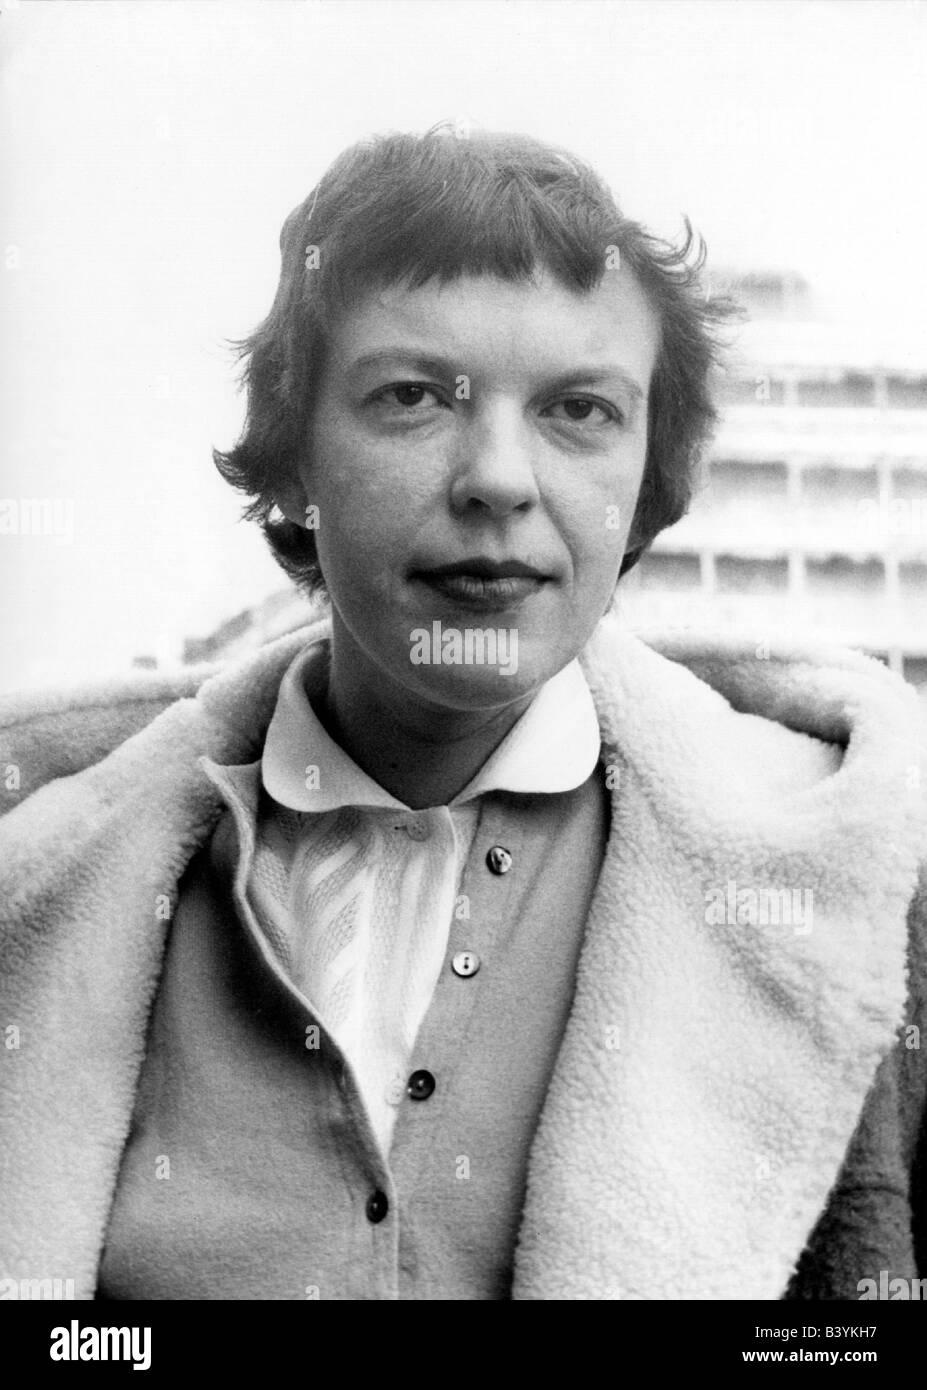 Ingeborg Bachmann an die sonne interpretation